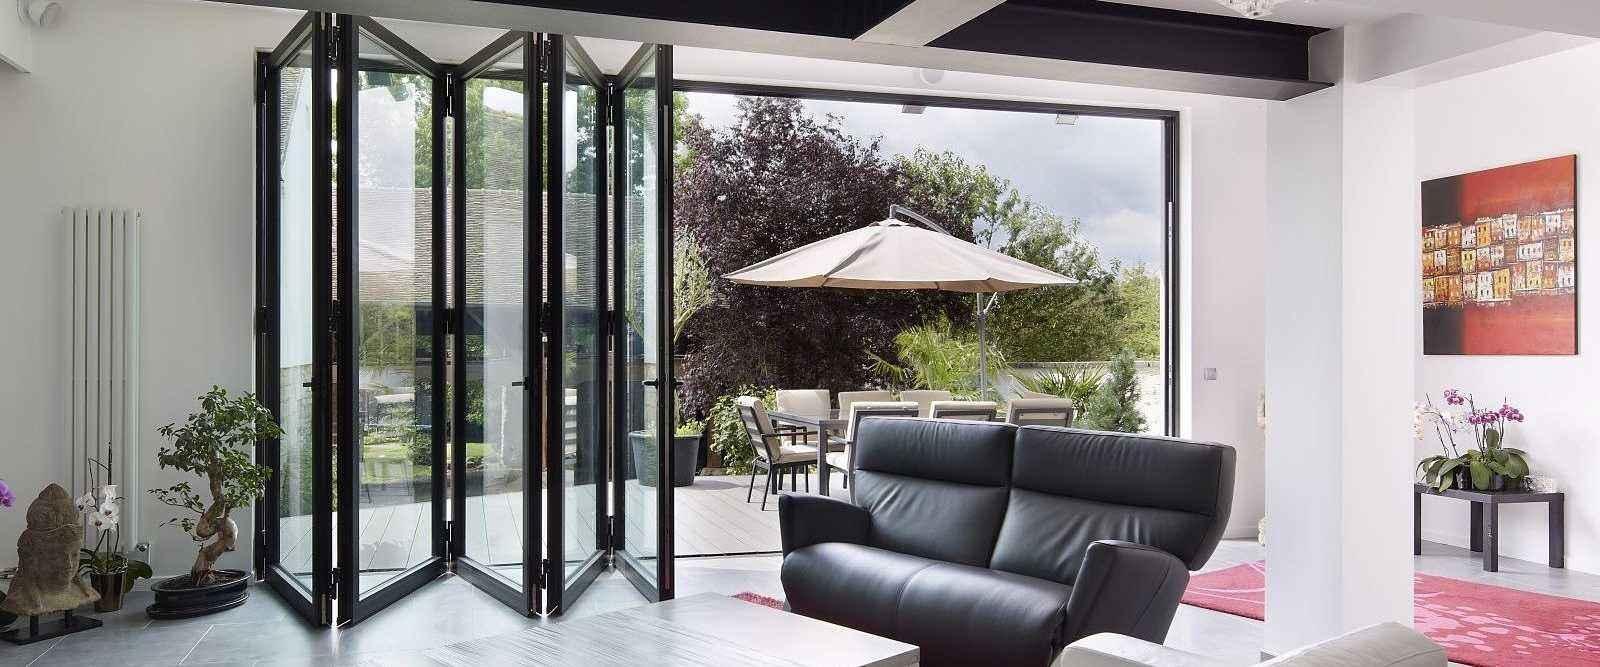 Aluminium Bifold Doors Made To Measure Marlin Windows